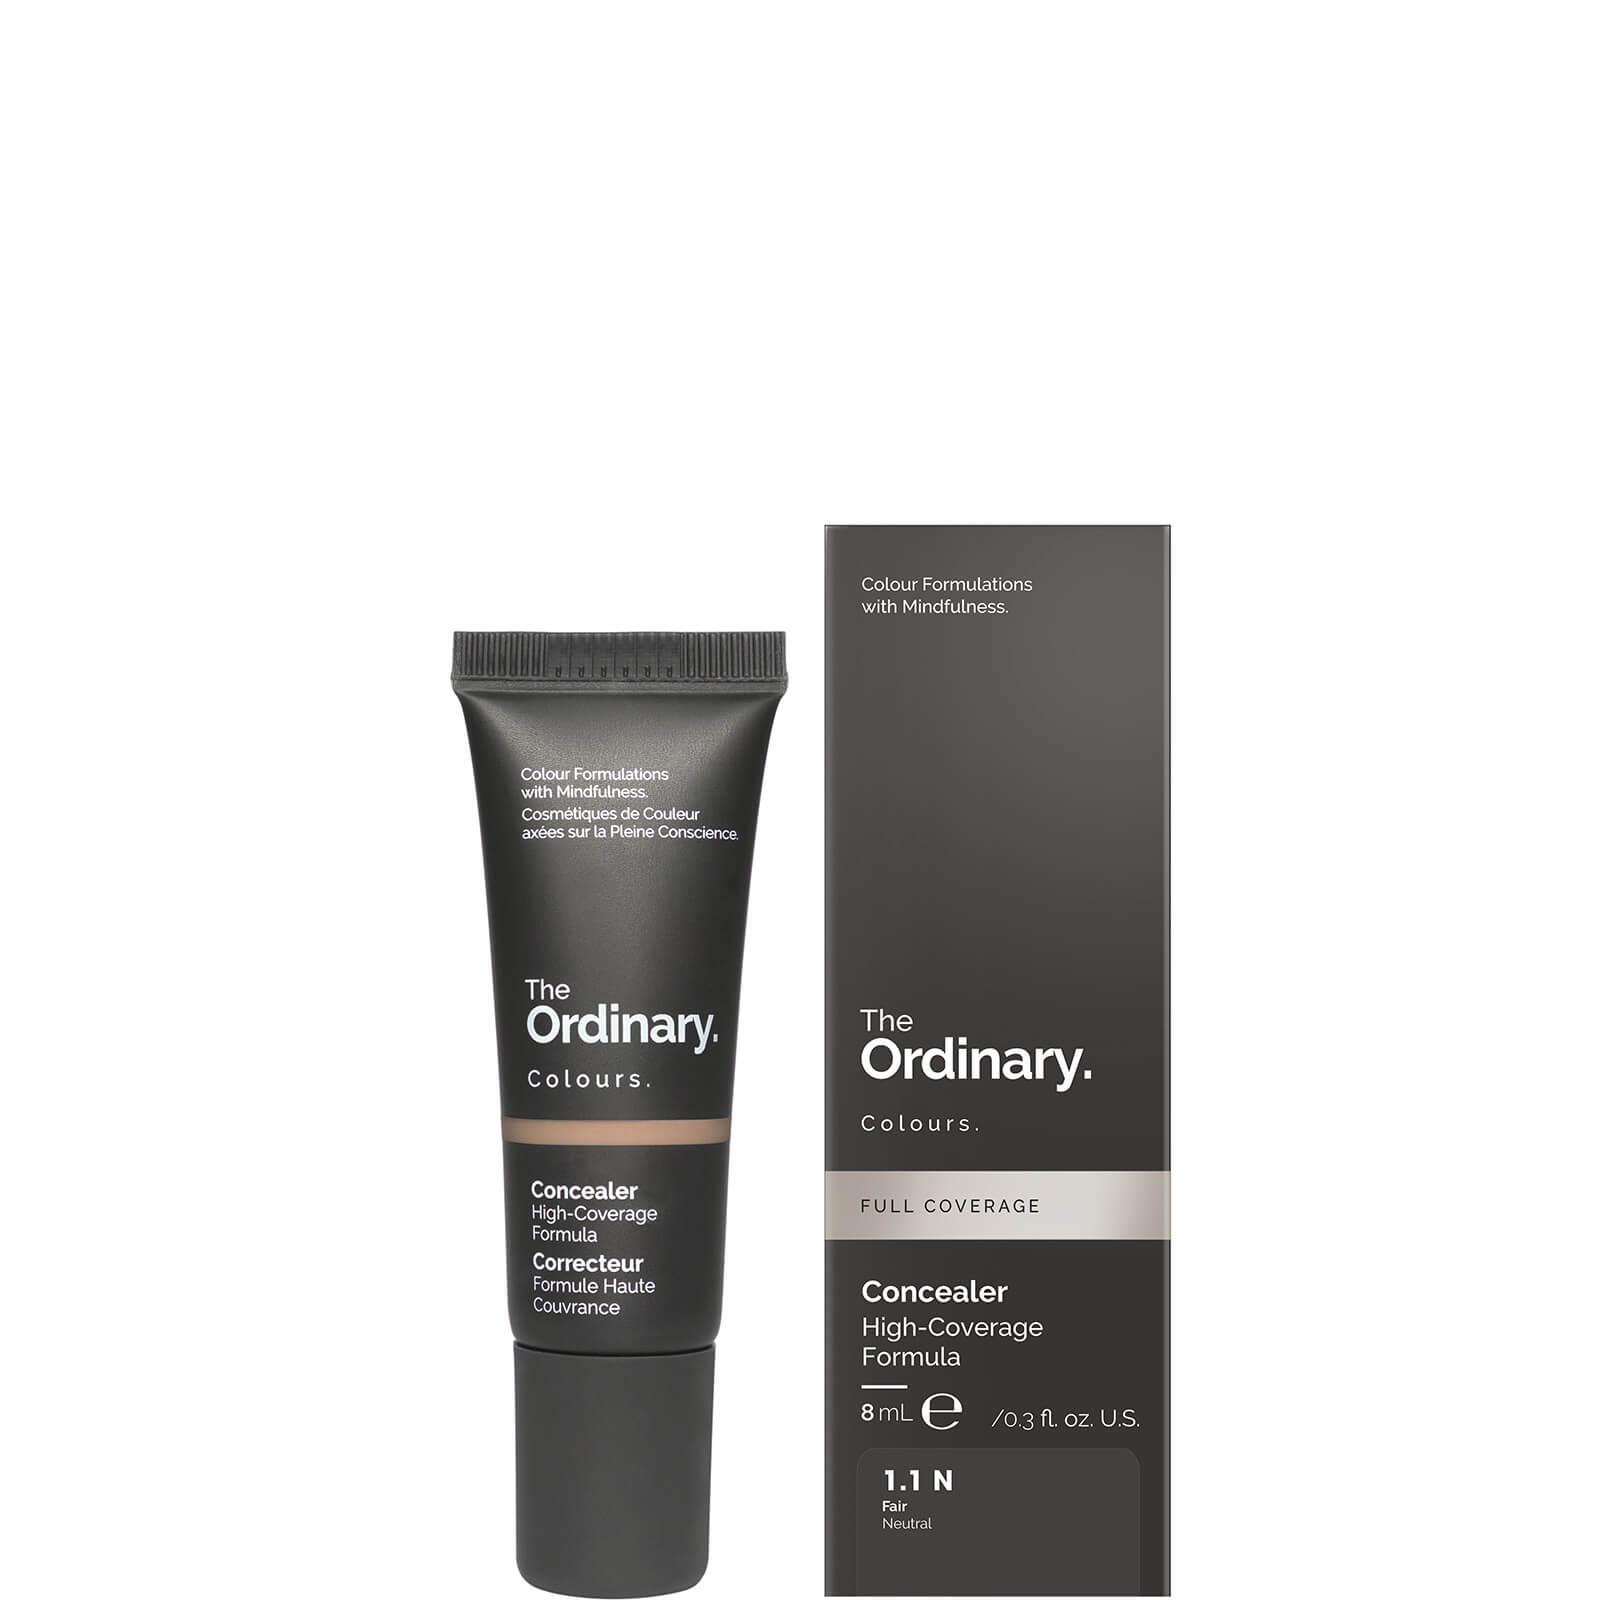 Купить The Ordinary Concealer 8ml (Various Shades) - 1.1 N